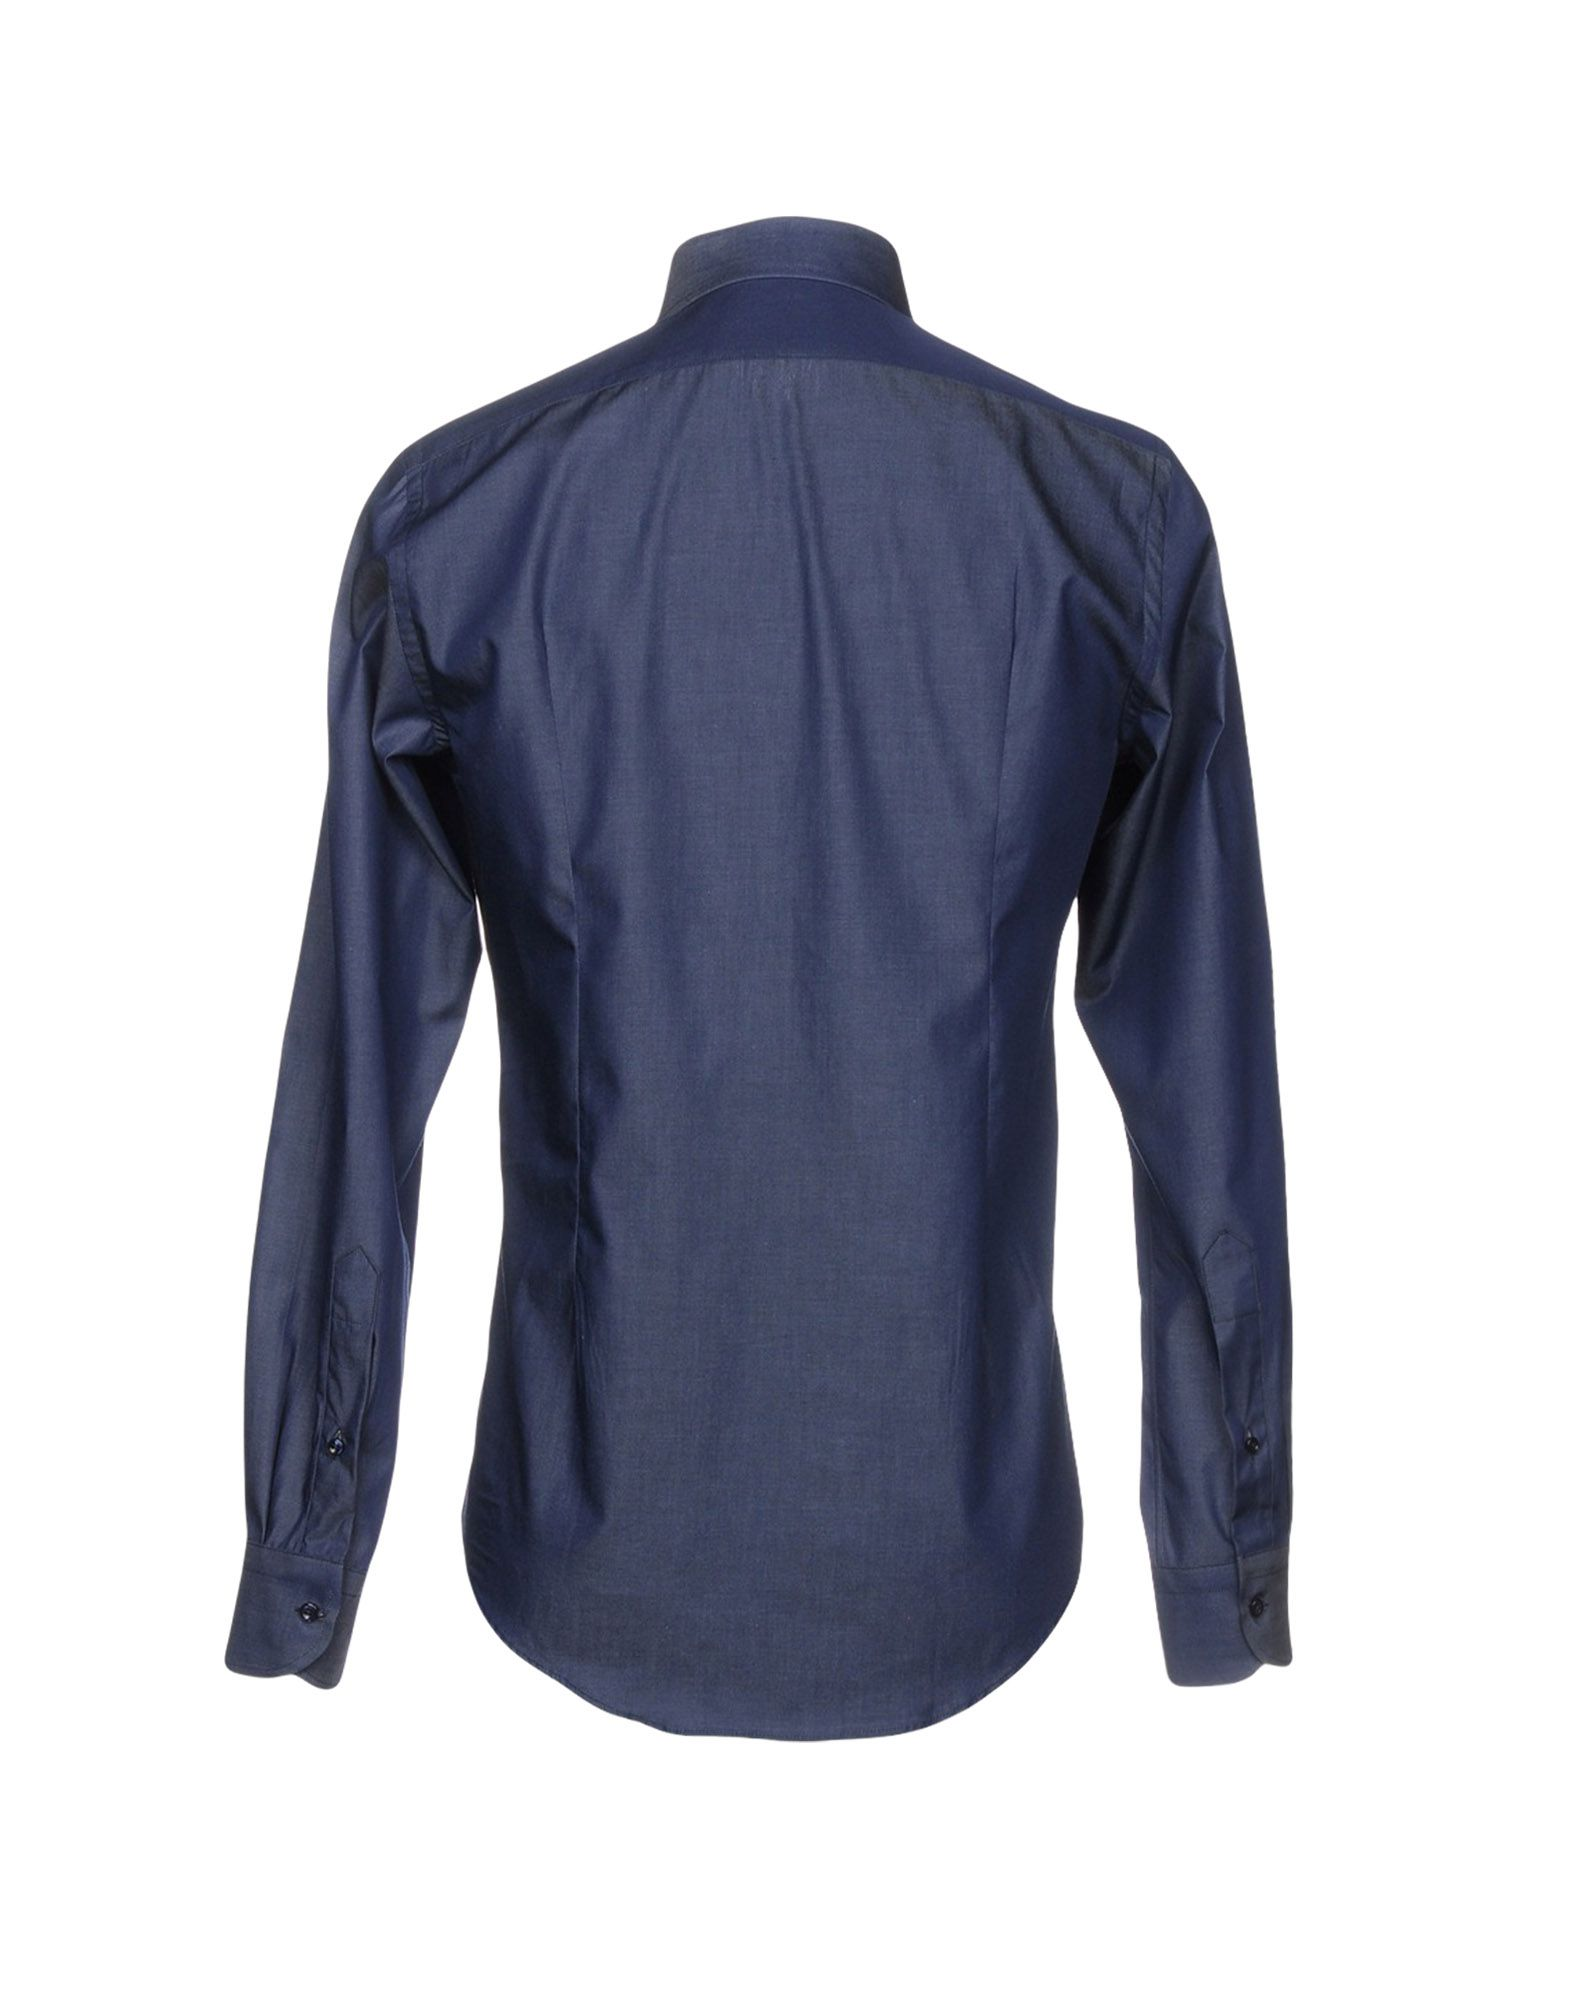 Camicia Tinta Unita Briams Uomo  Uomo Briams - 38728025XW 4a4ea6